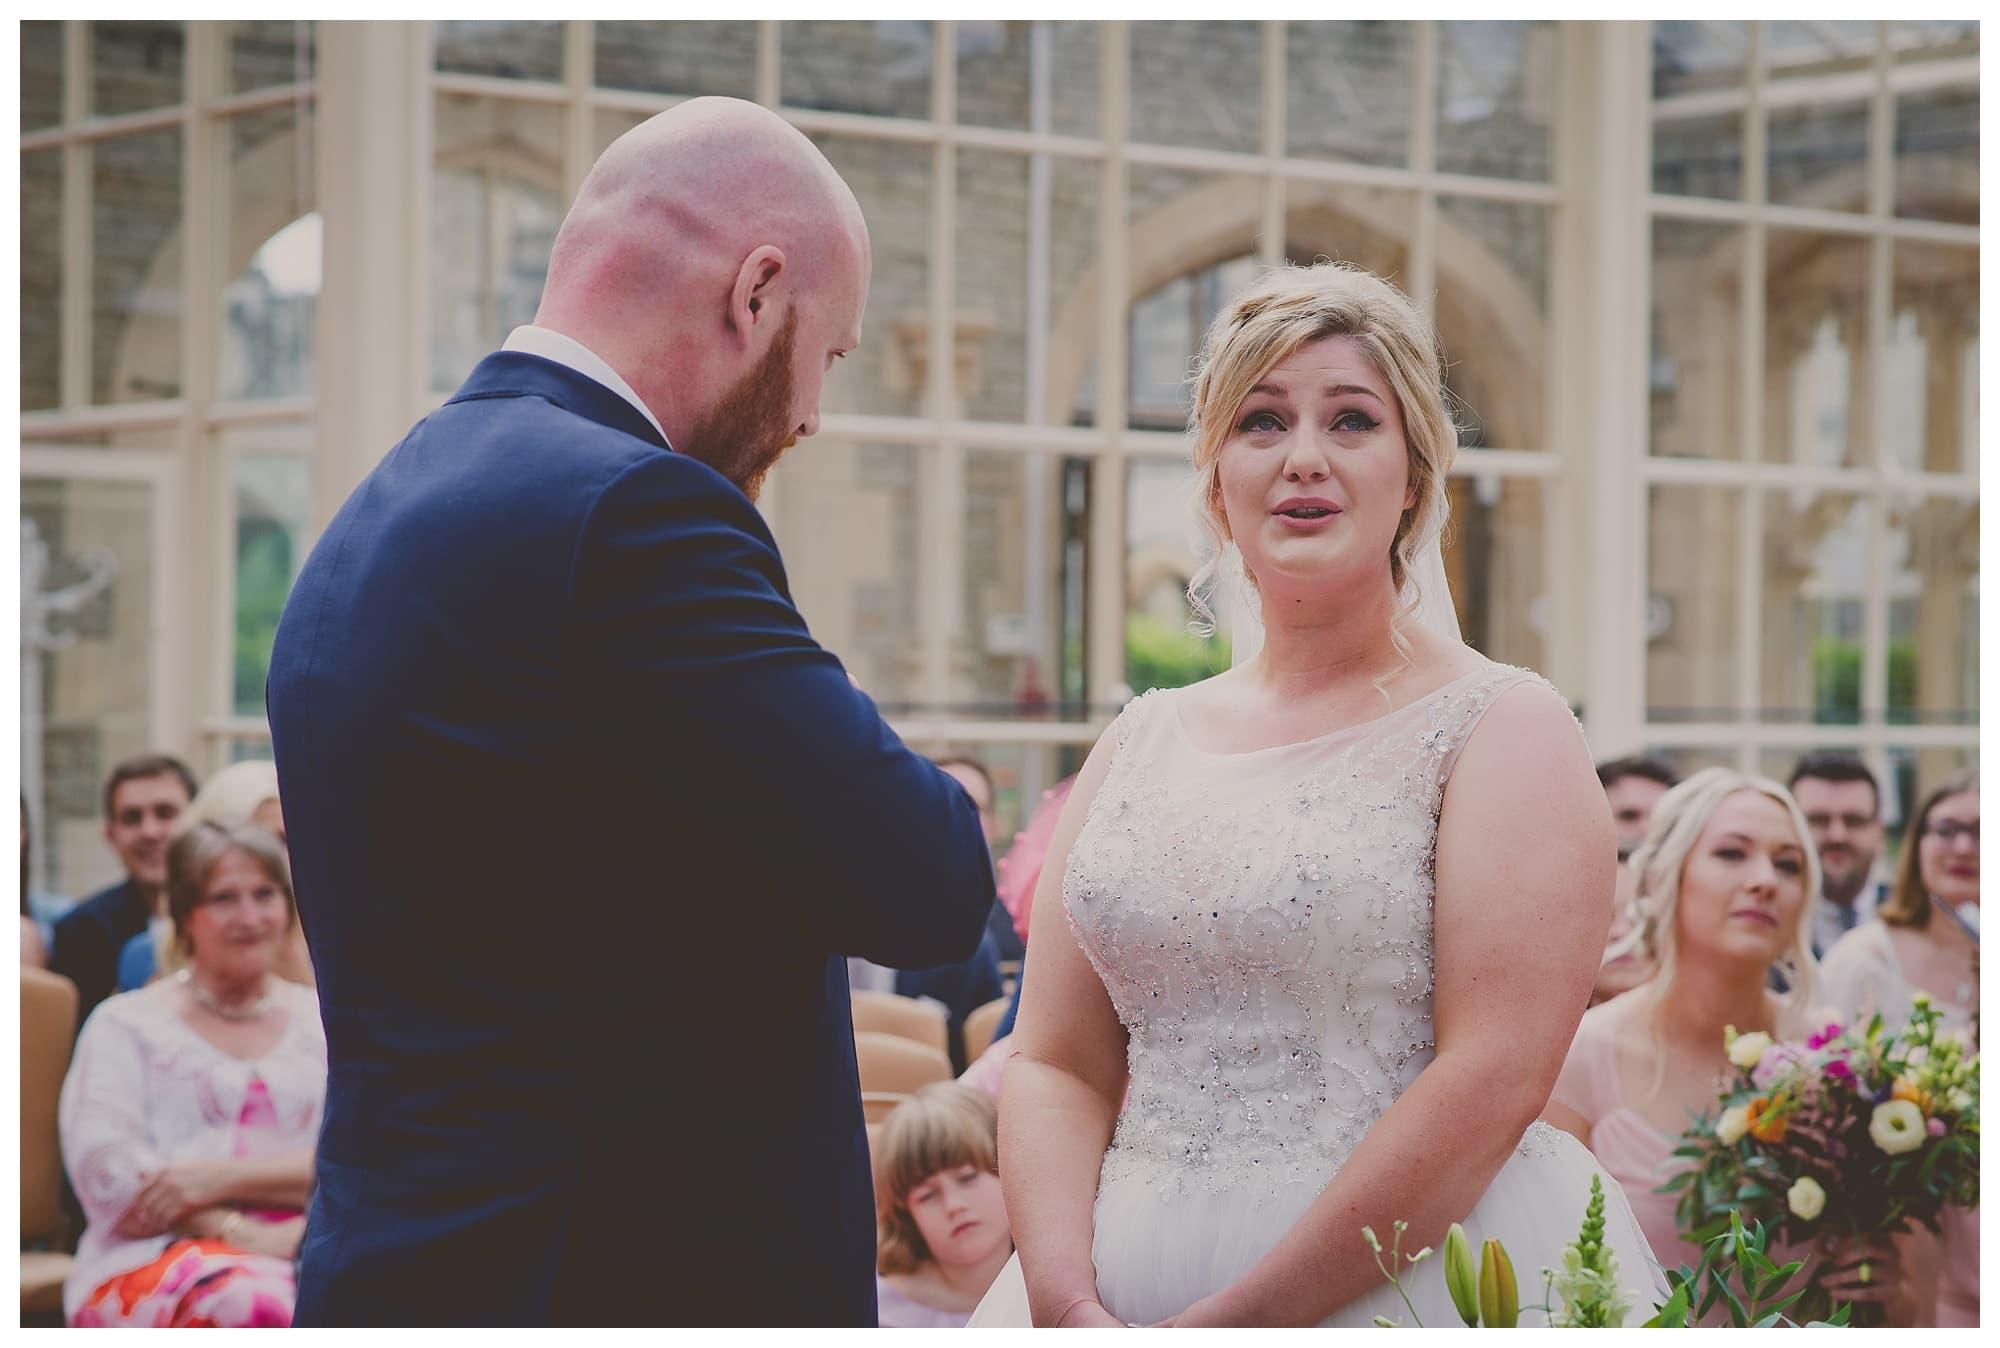 staffordshire wedding photography creative wedding photography natural fun wedding photography